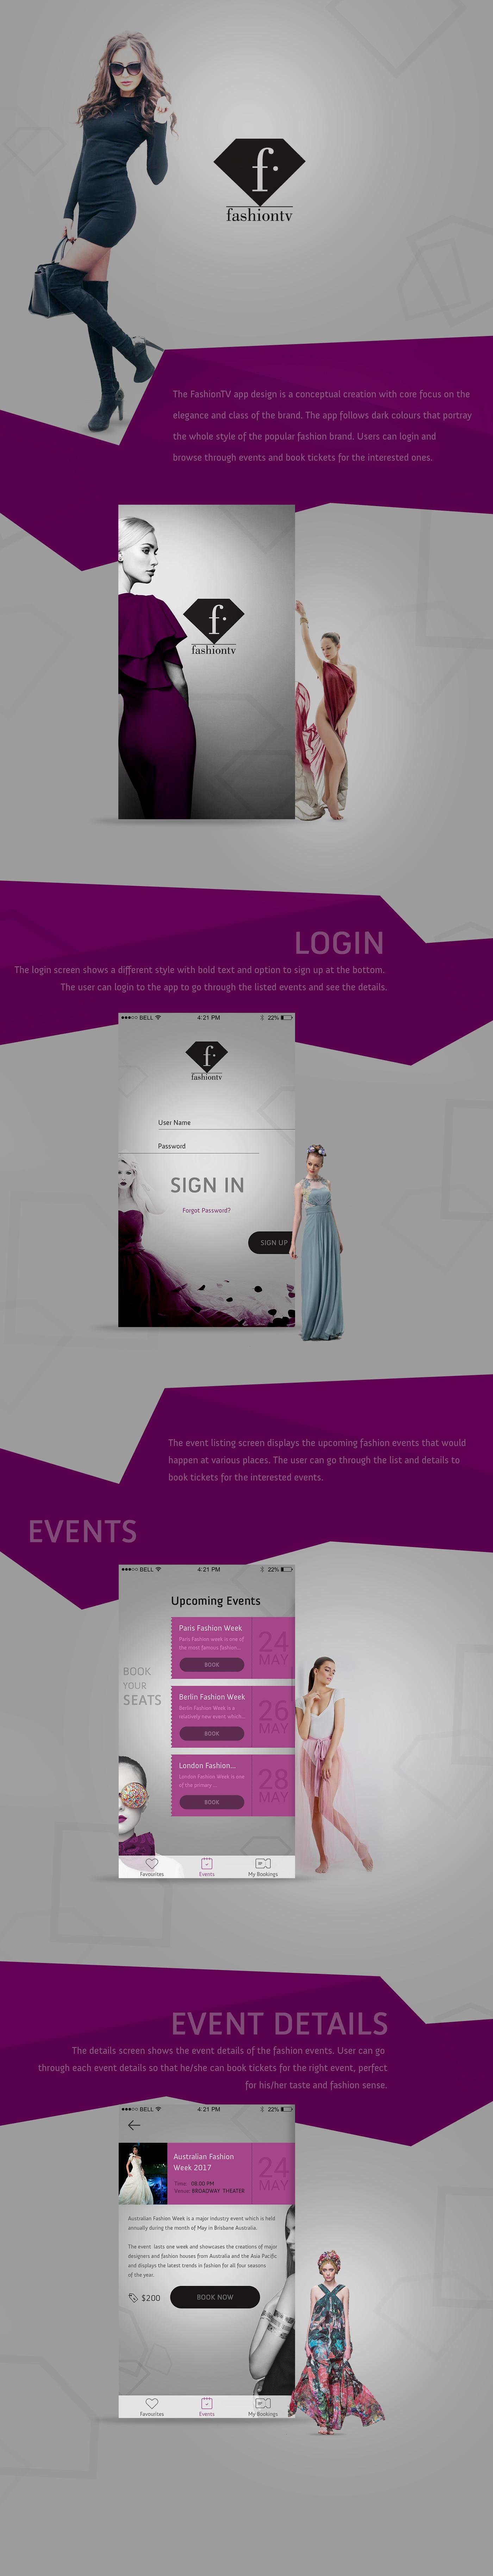 mobile app design app design ui design UX design user interface design